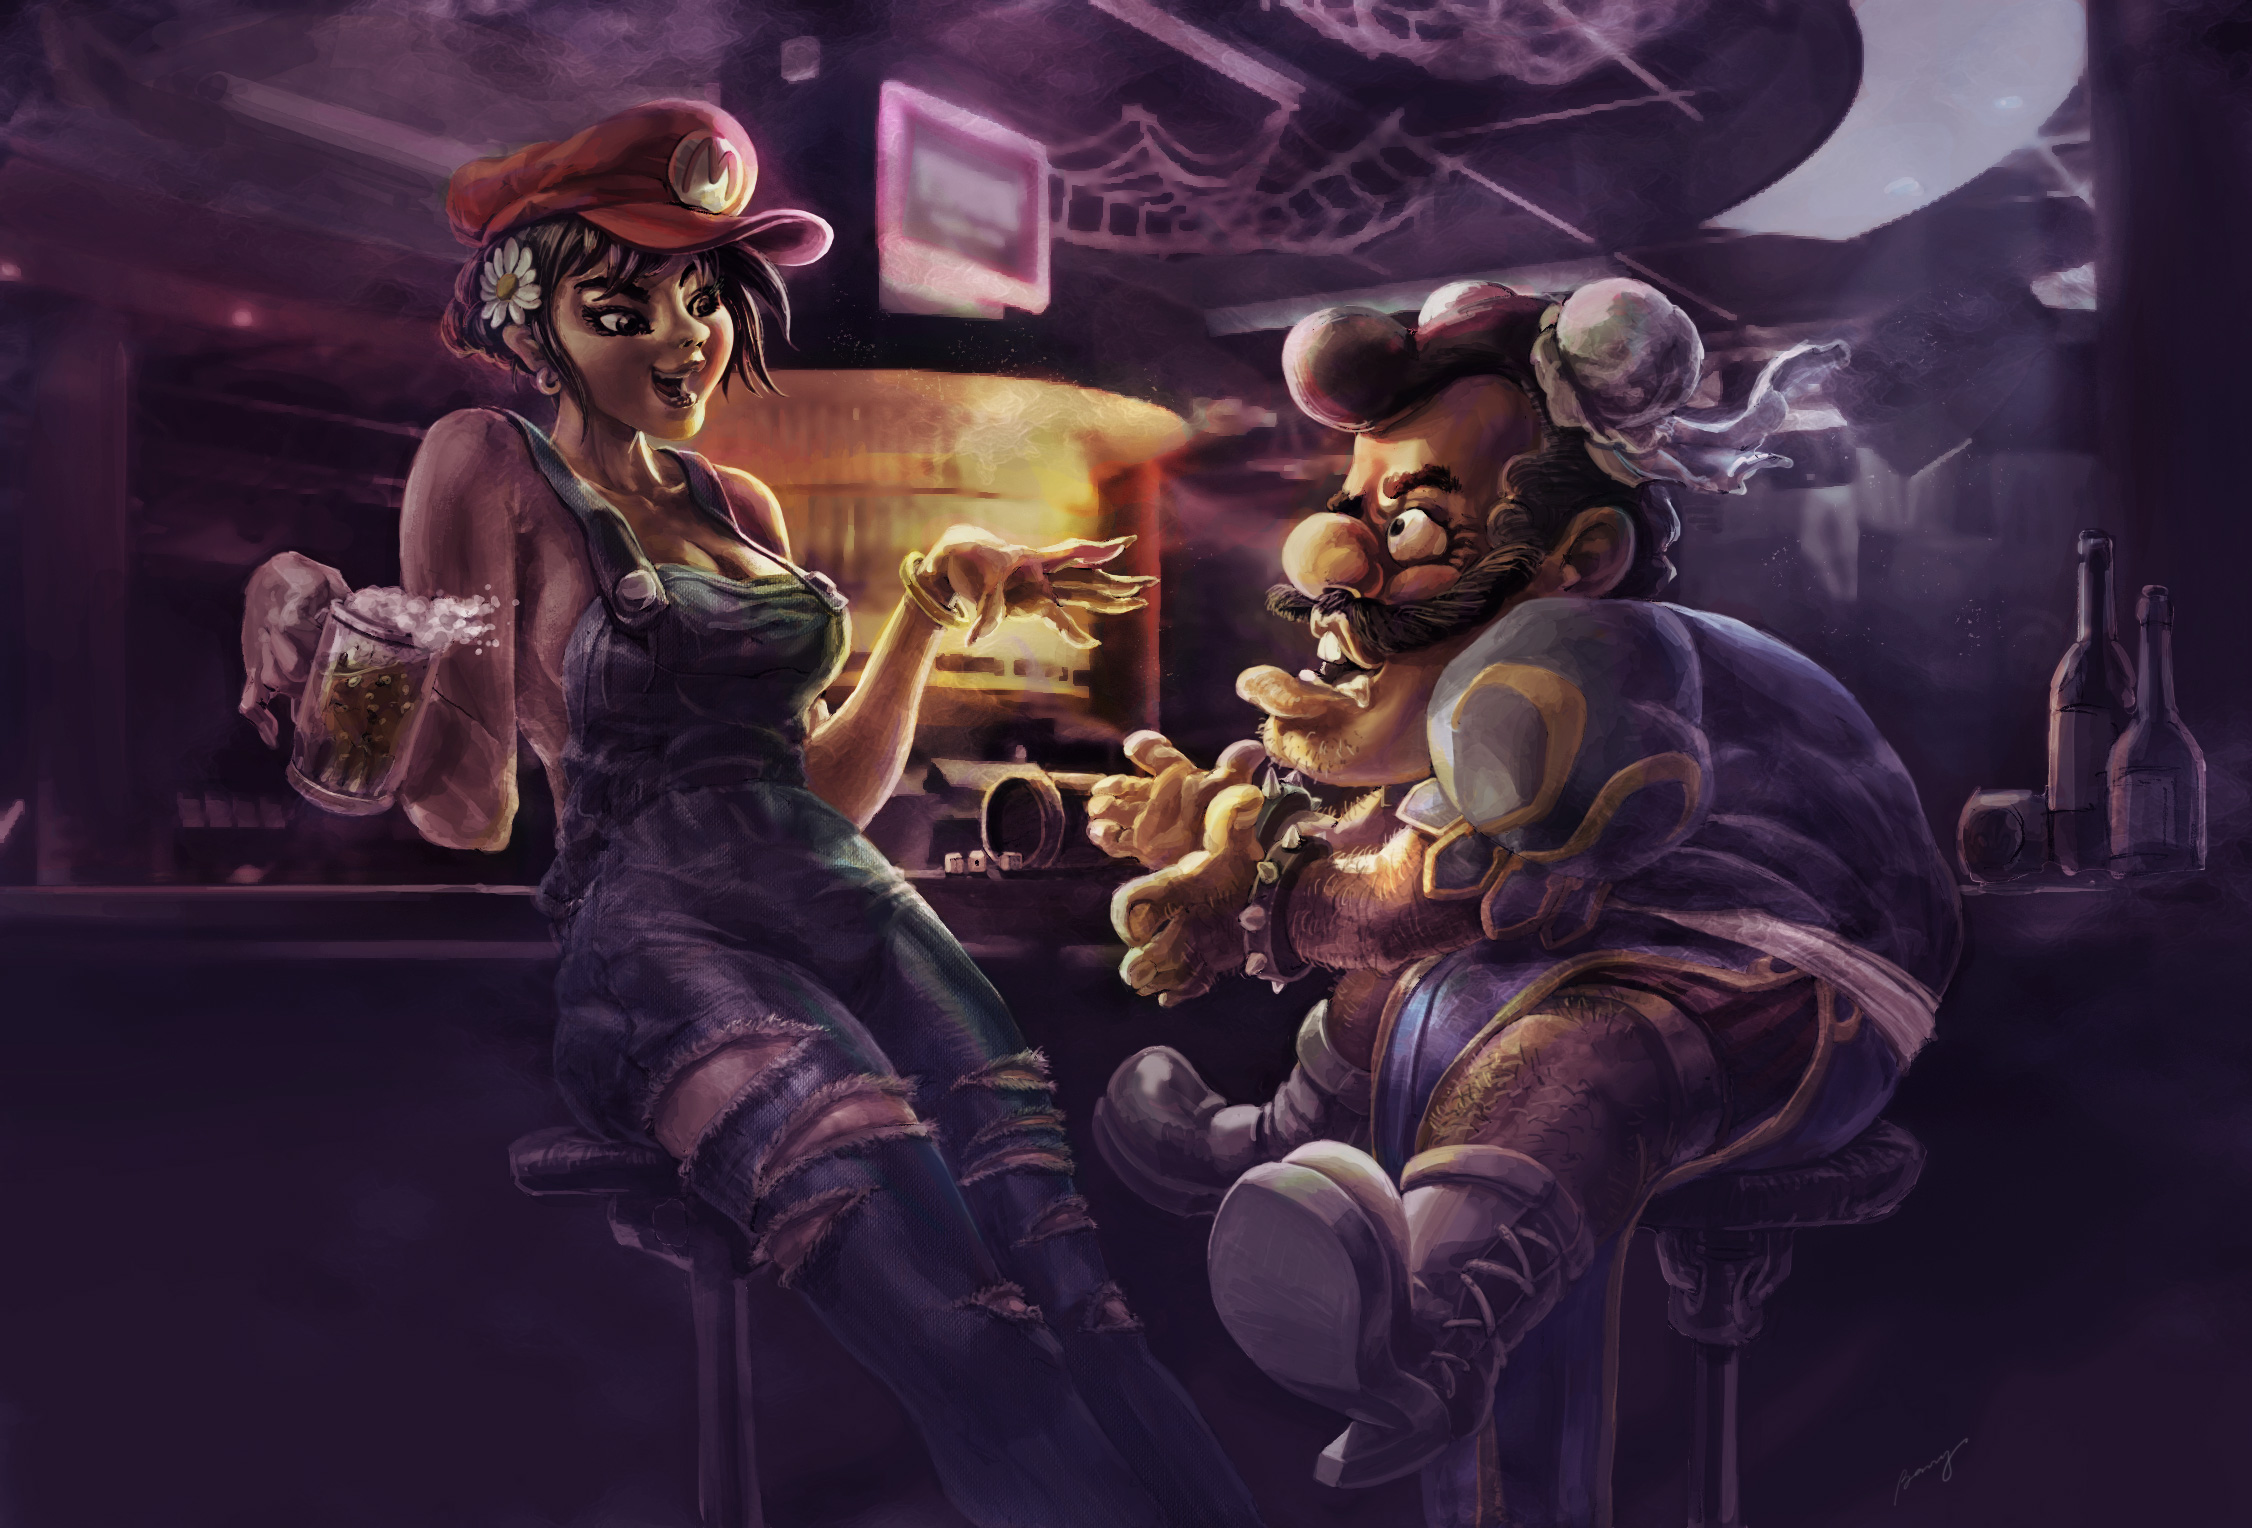 Mario and Chunli by benryyou